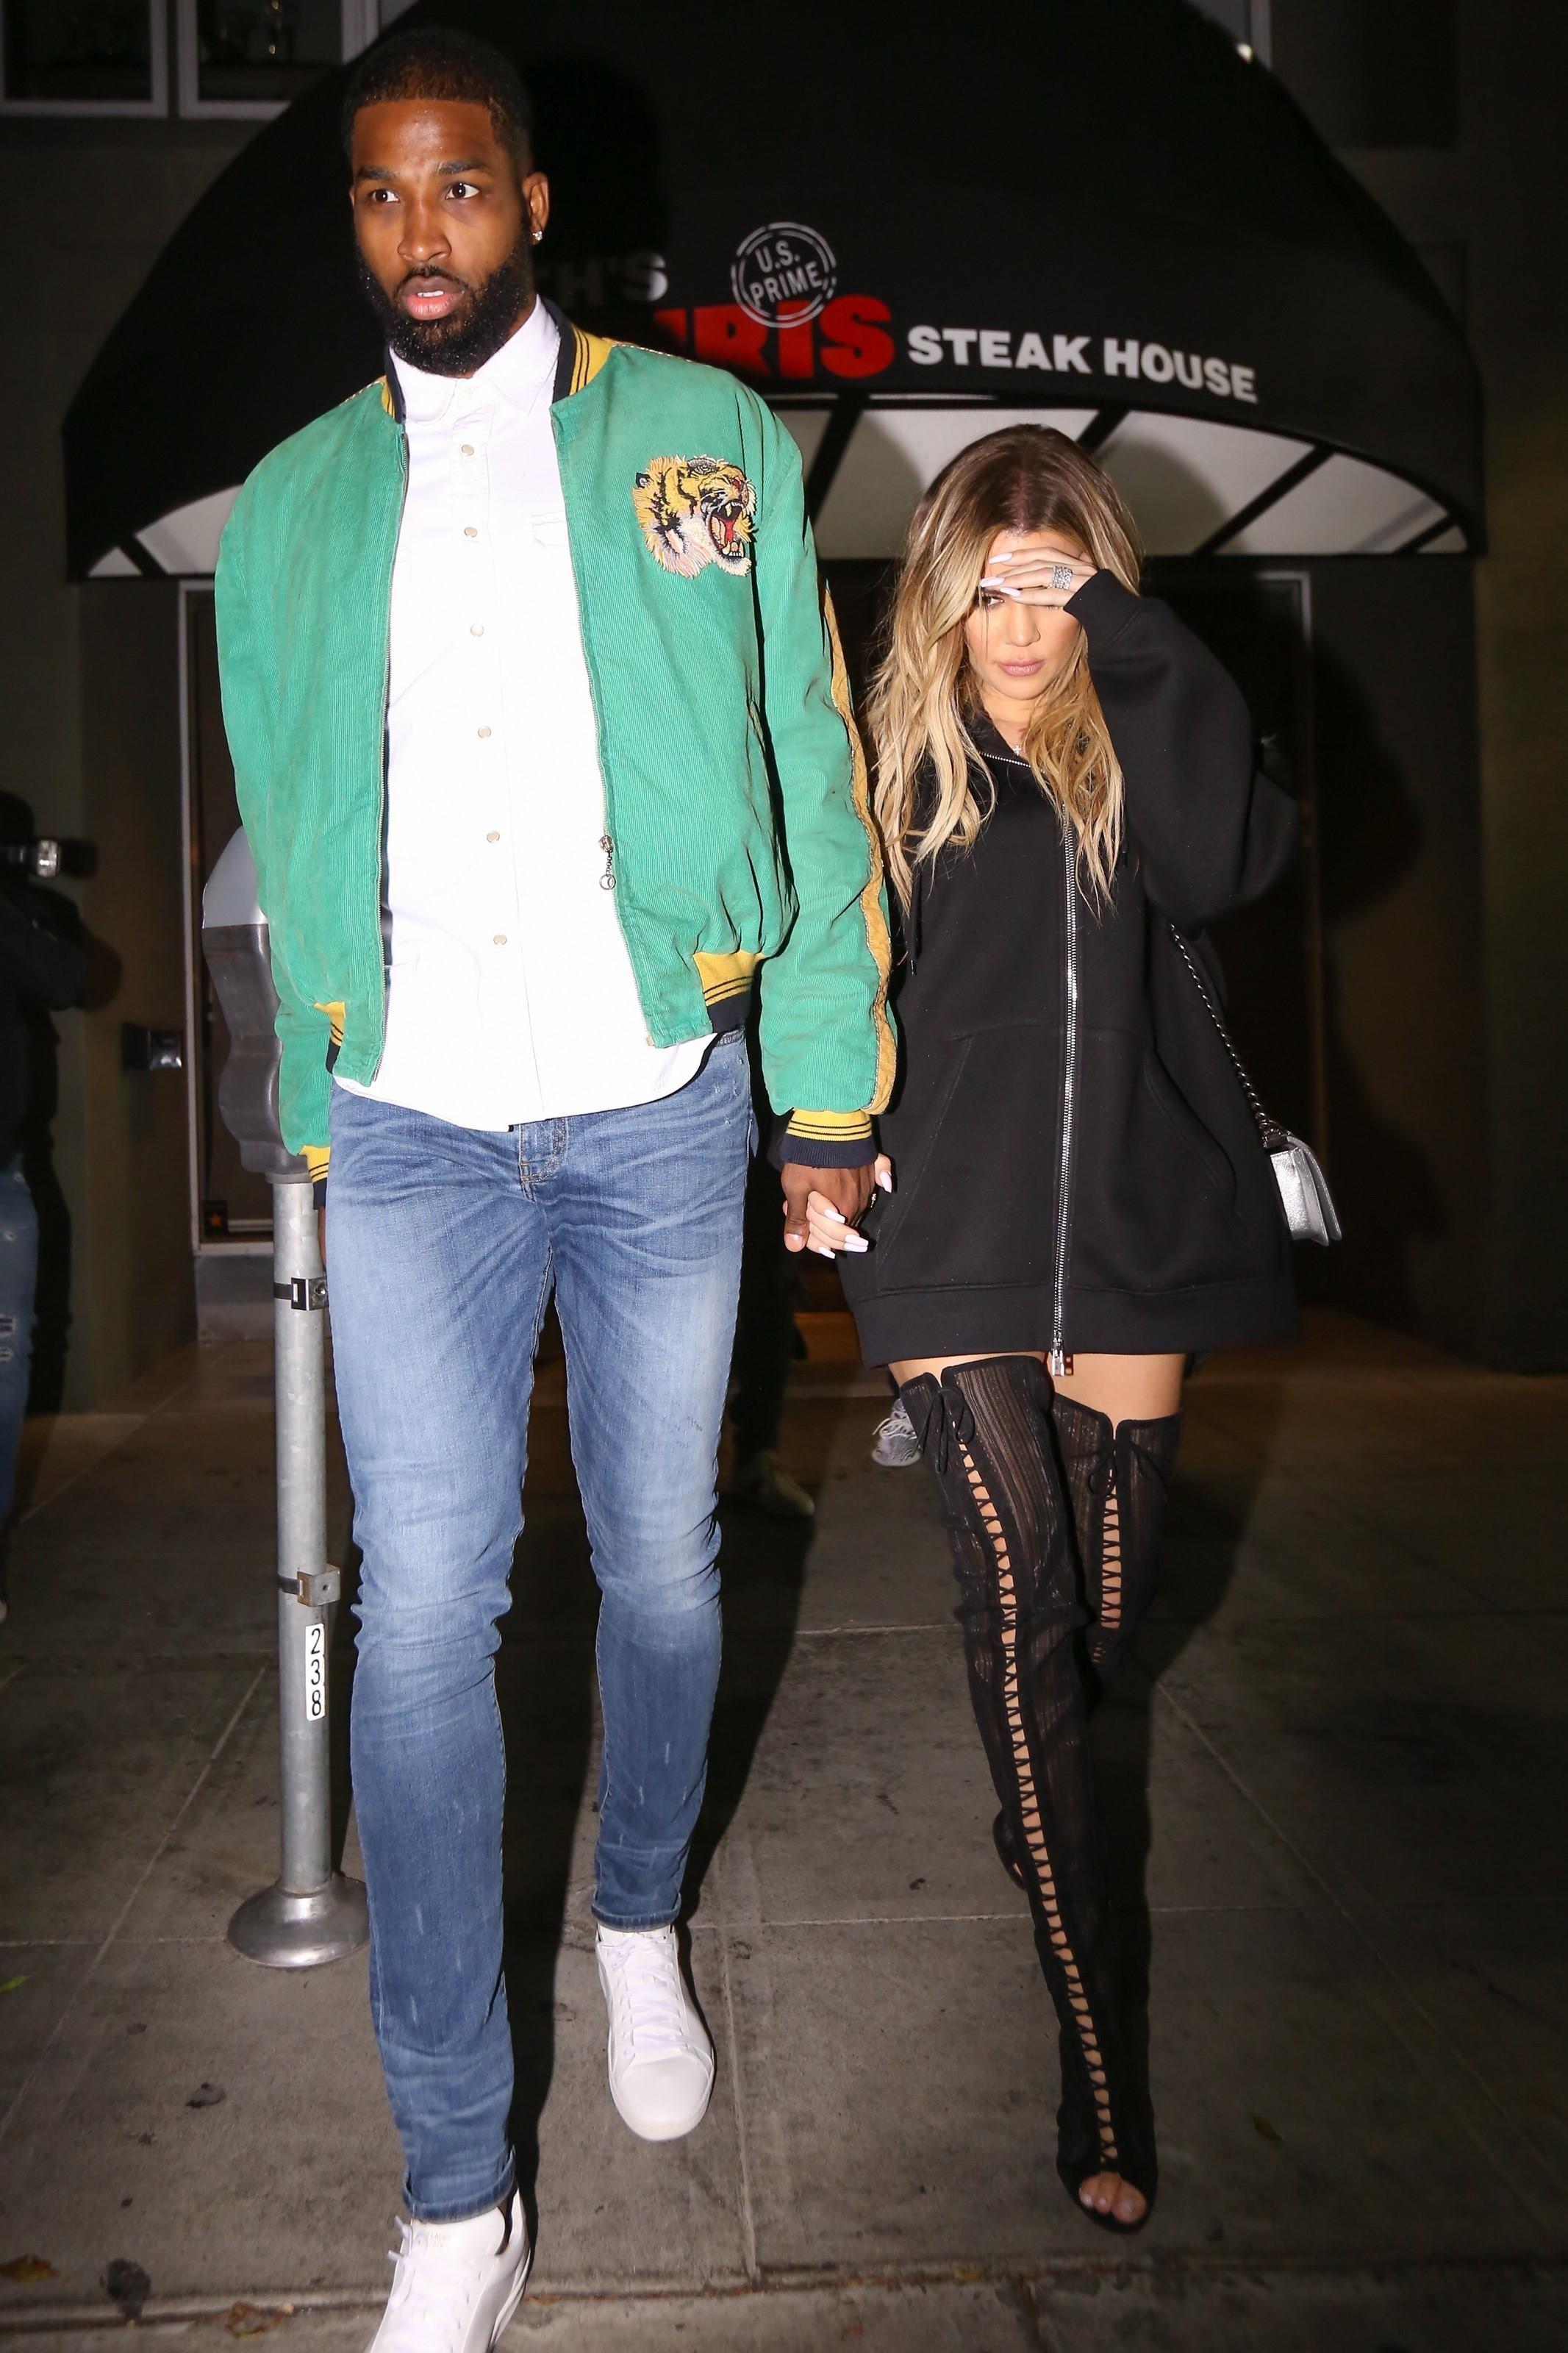 Khloe Kardashian shows off diamond rings on date with Tristan Thompson